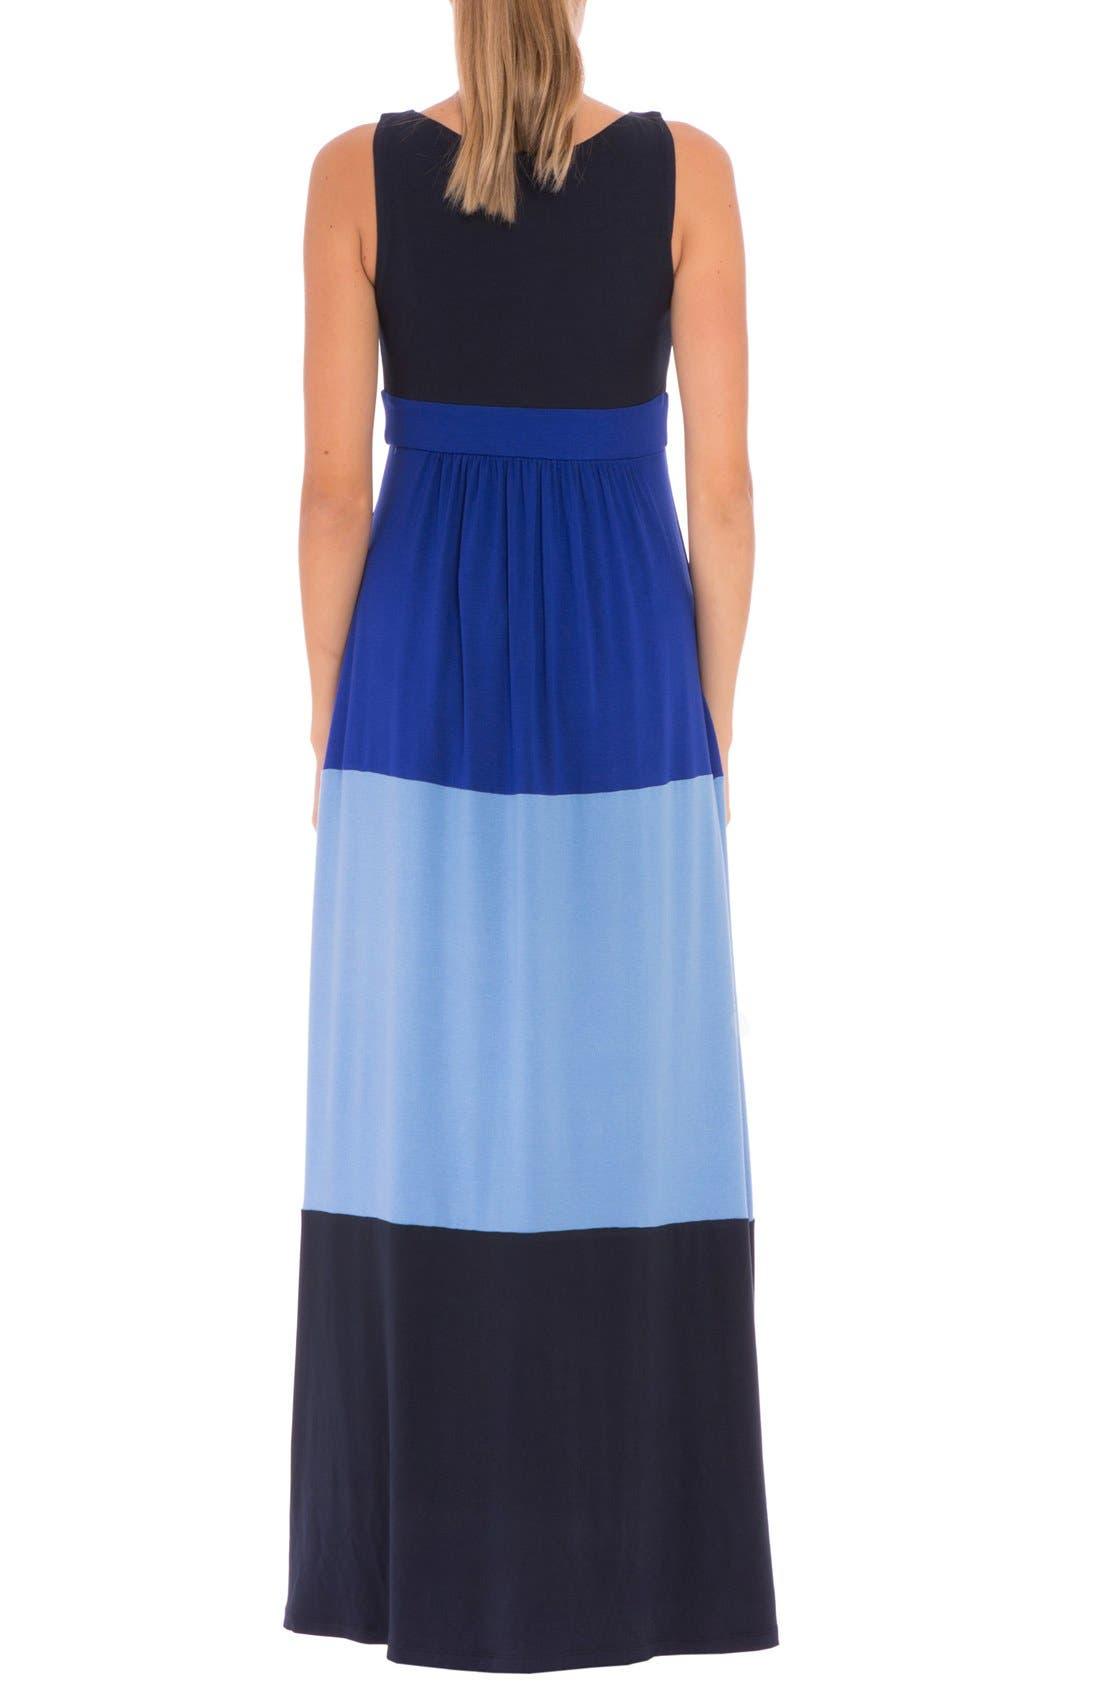 'Margarette' Colorblock Maternity Tank Dress,                             Alternate thumbnail 2, color,                             Navy